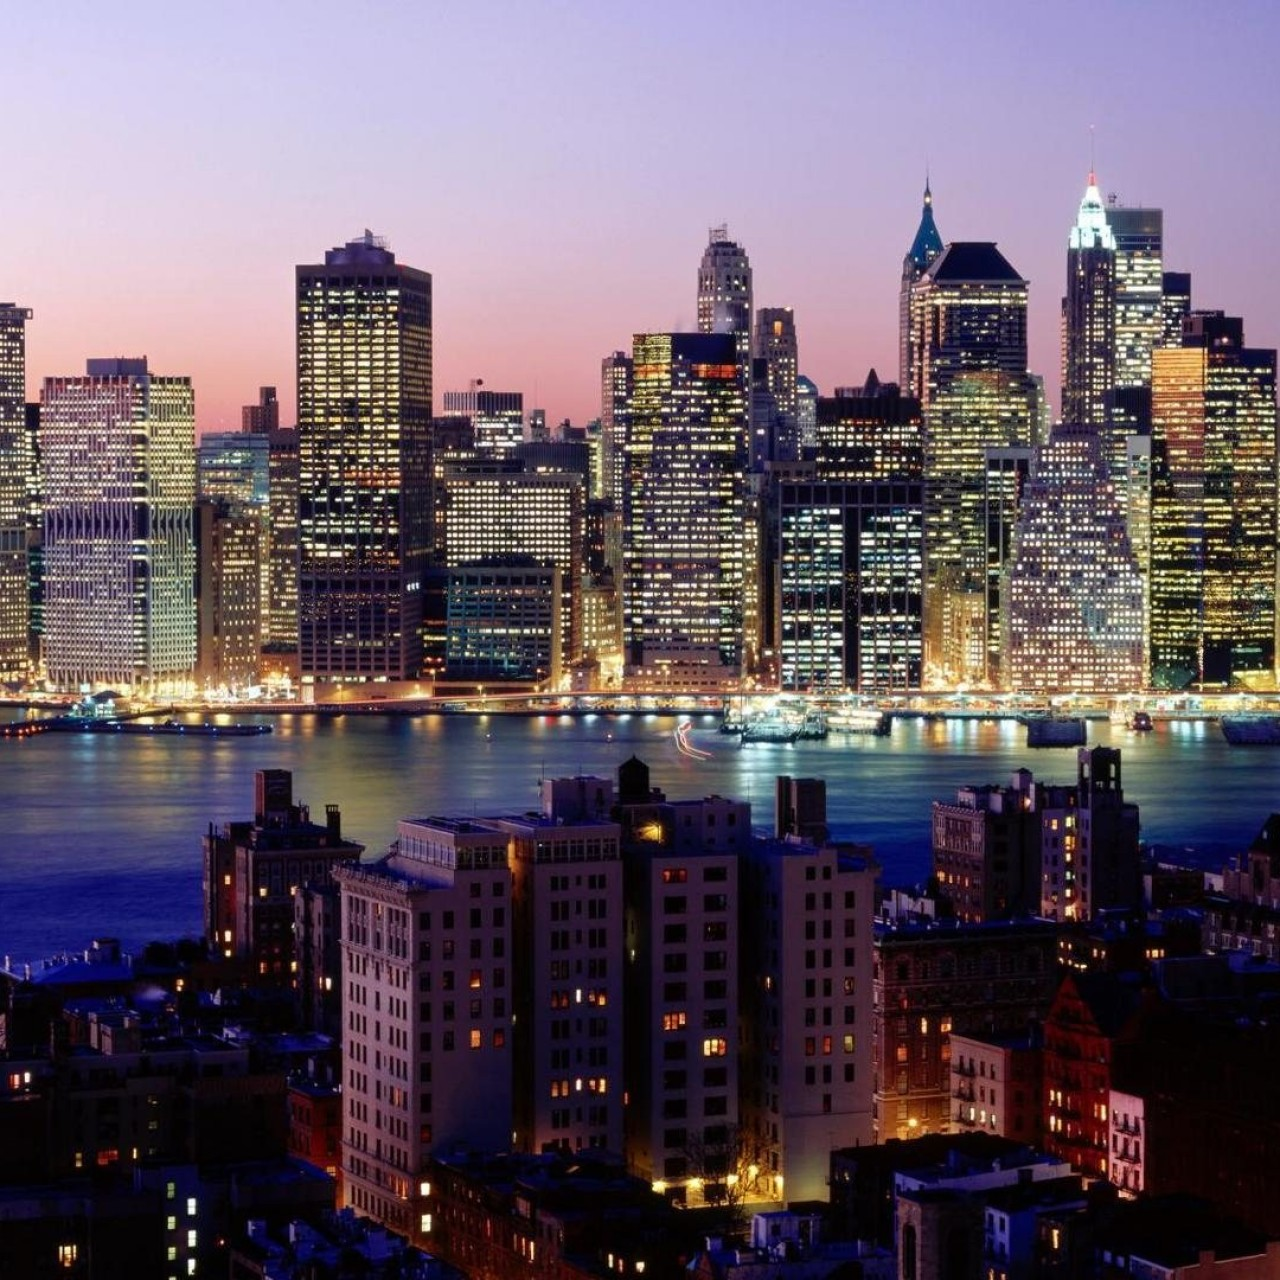 Lighting Nyc: [45+] New York City Lights Wallpaper On WallpaperSafari